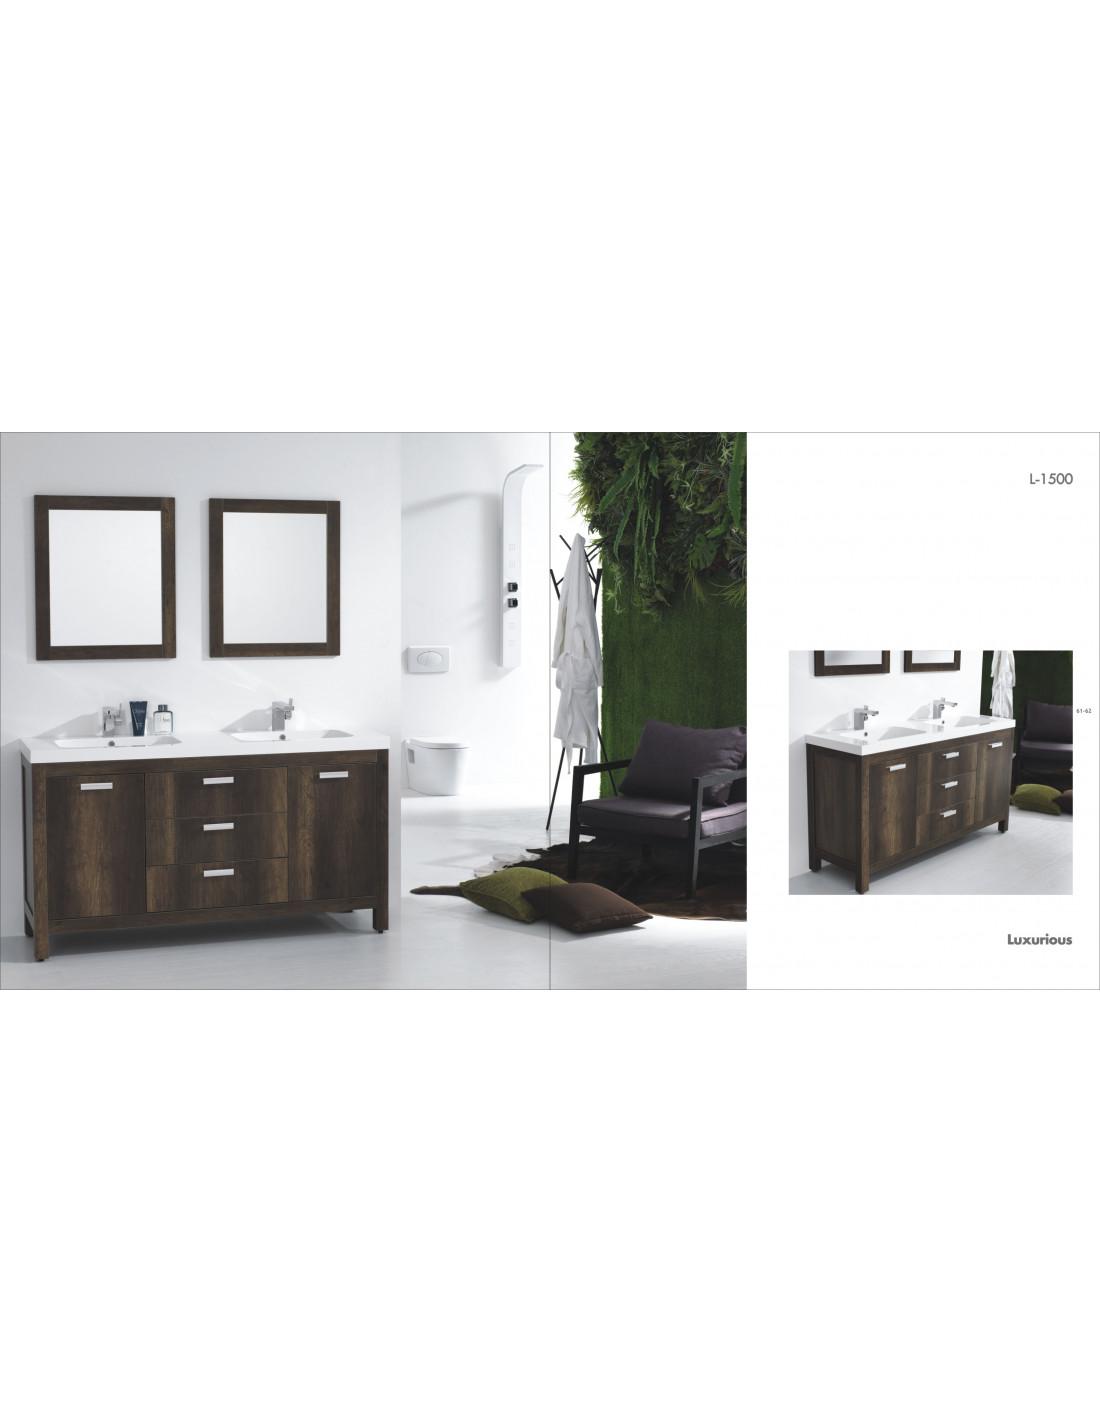 Meubles Cloison Double Face ensemble de meubles de salle de bain double vasques